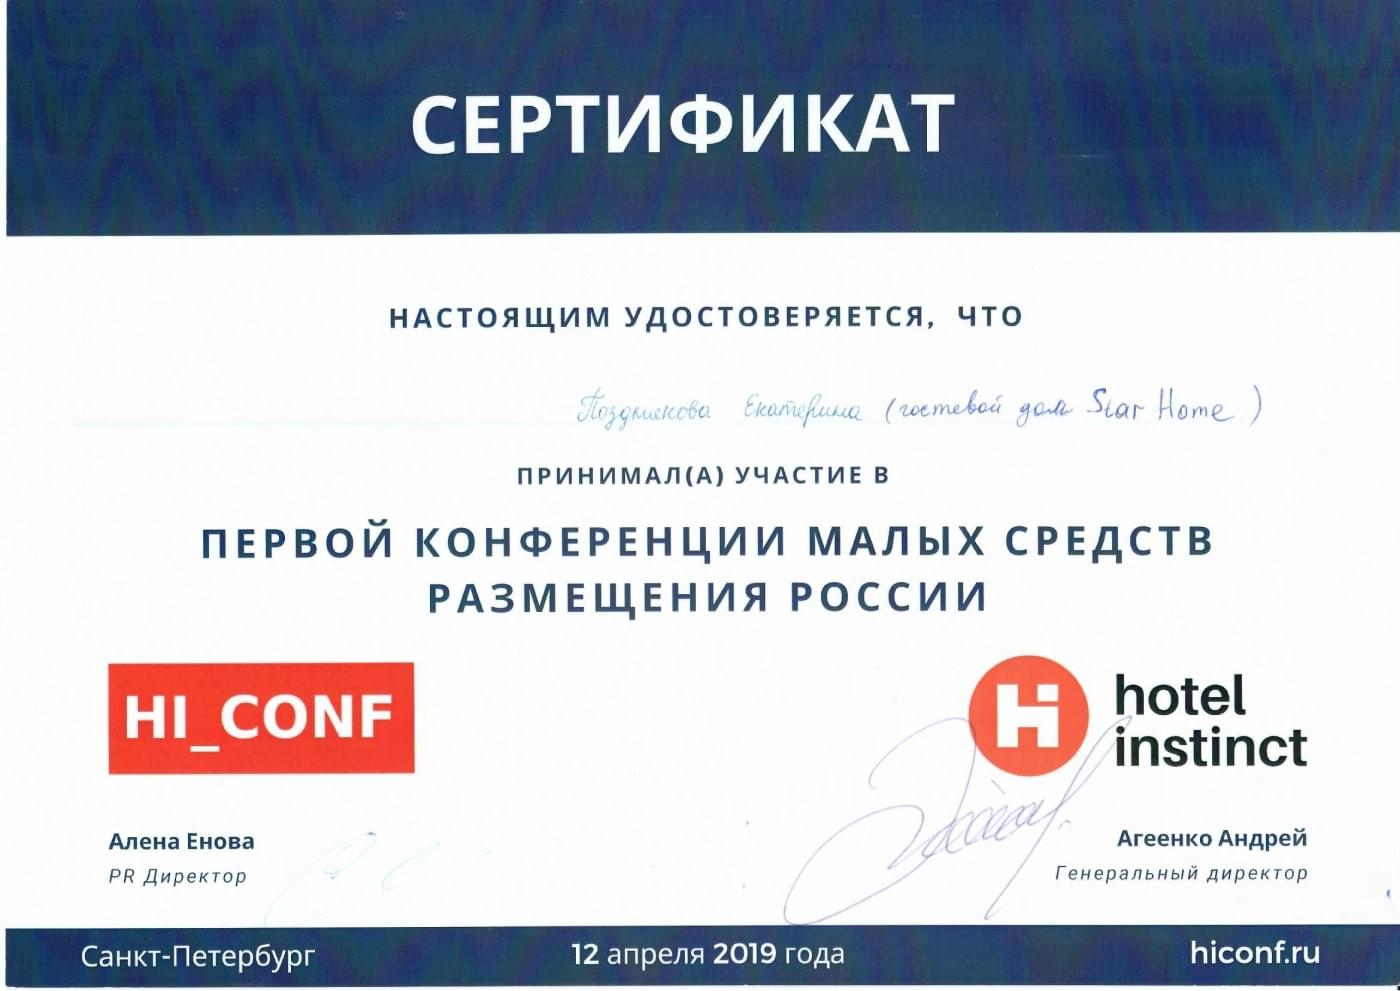 Сертификат от hiconf